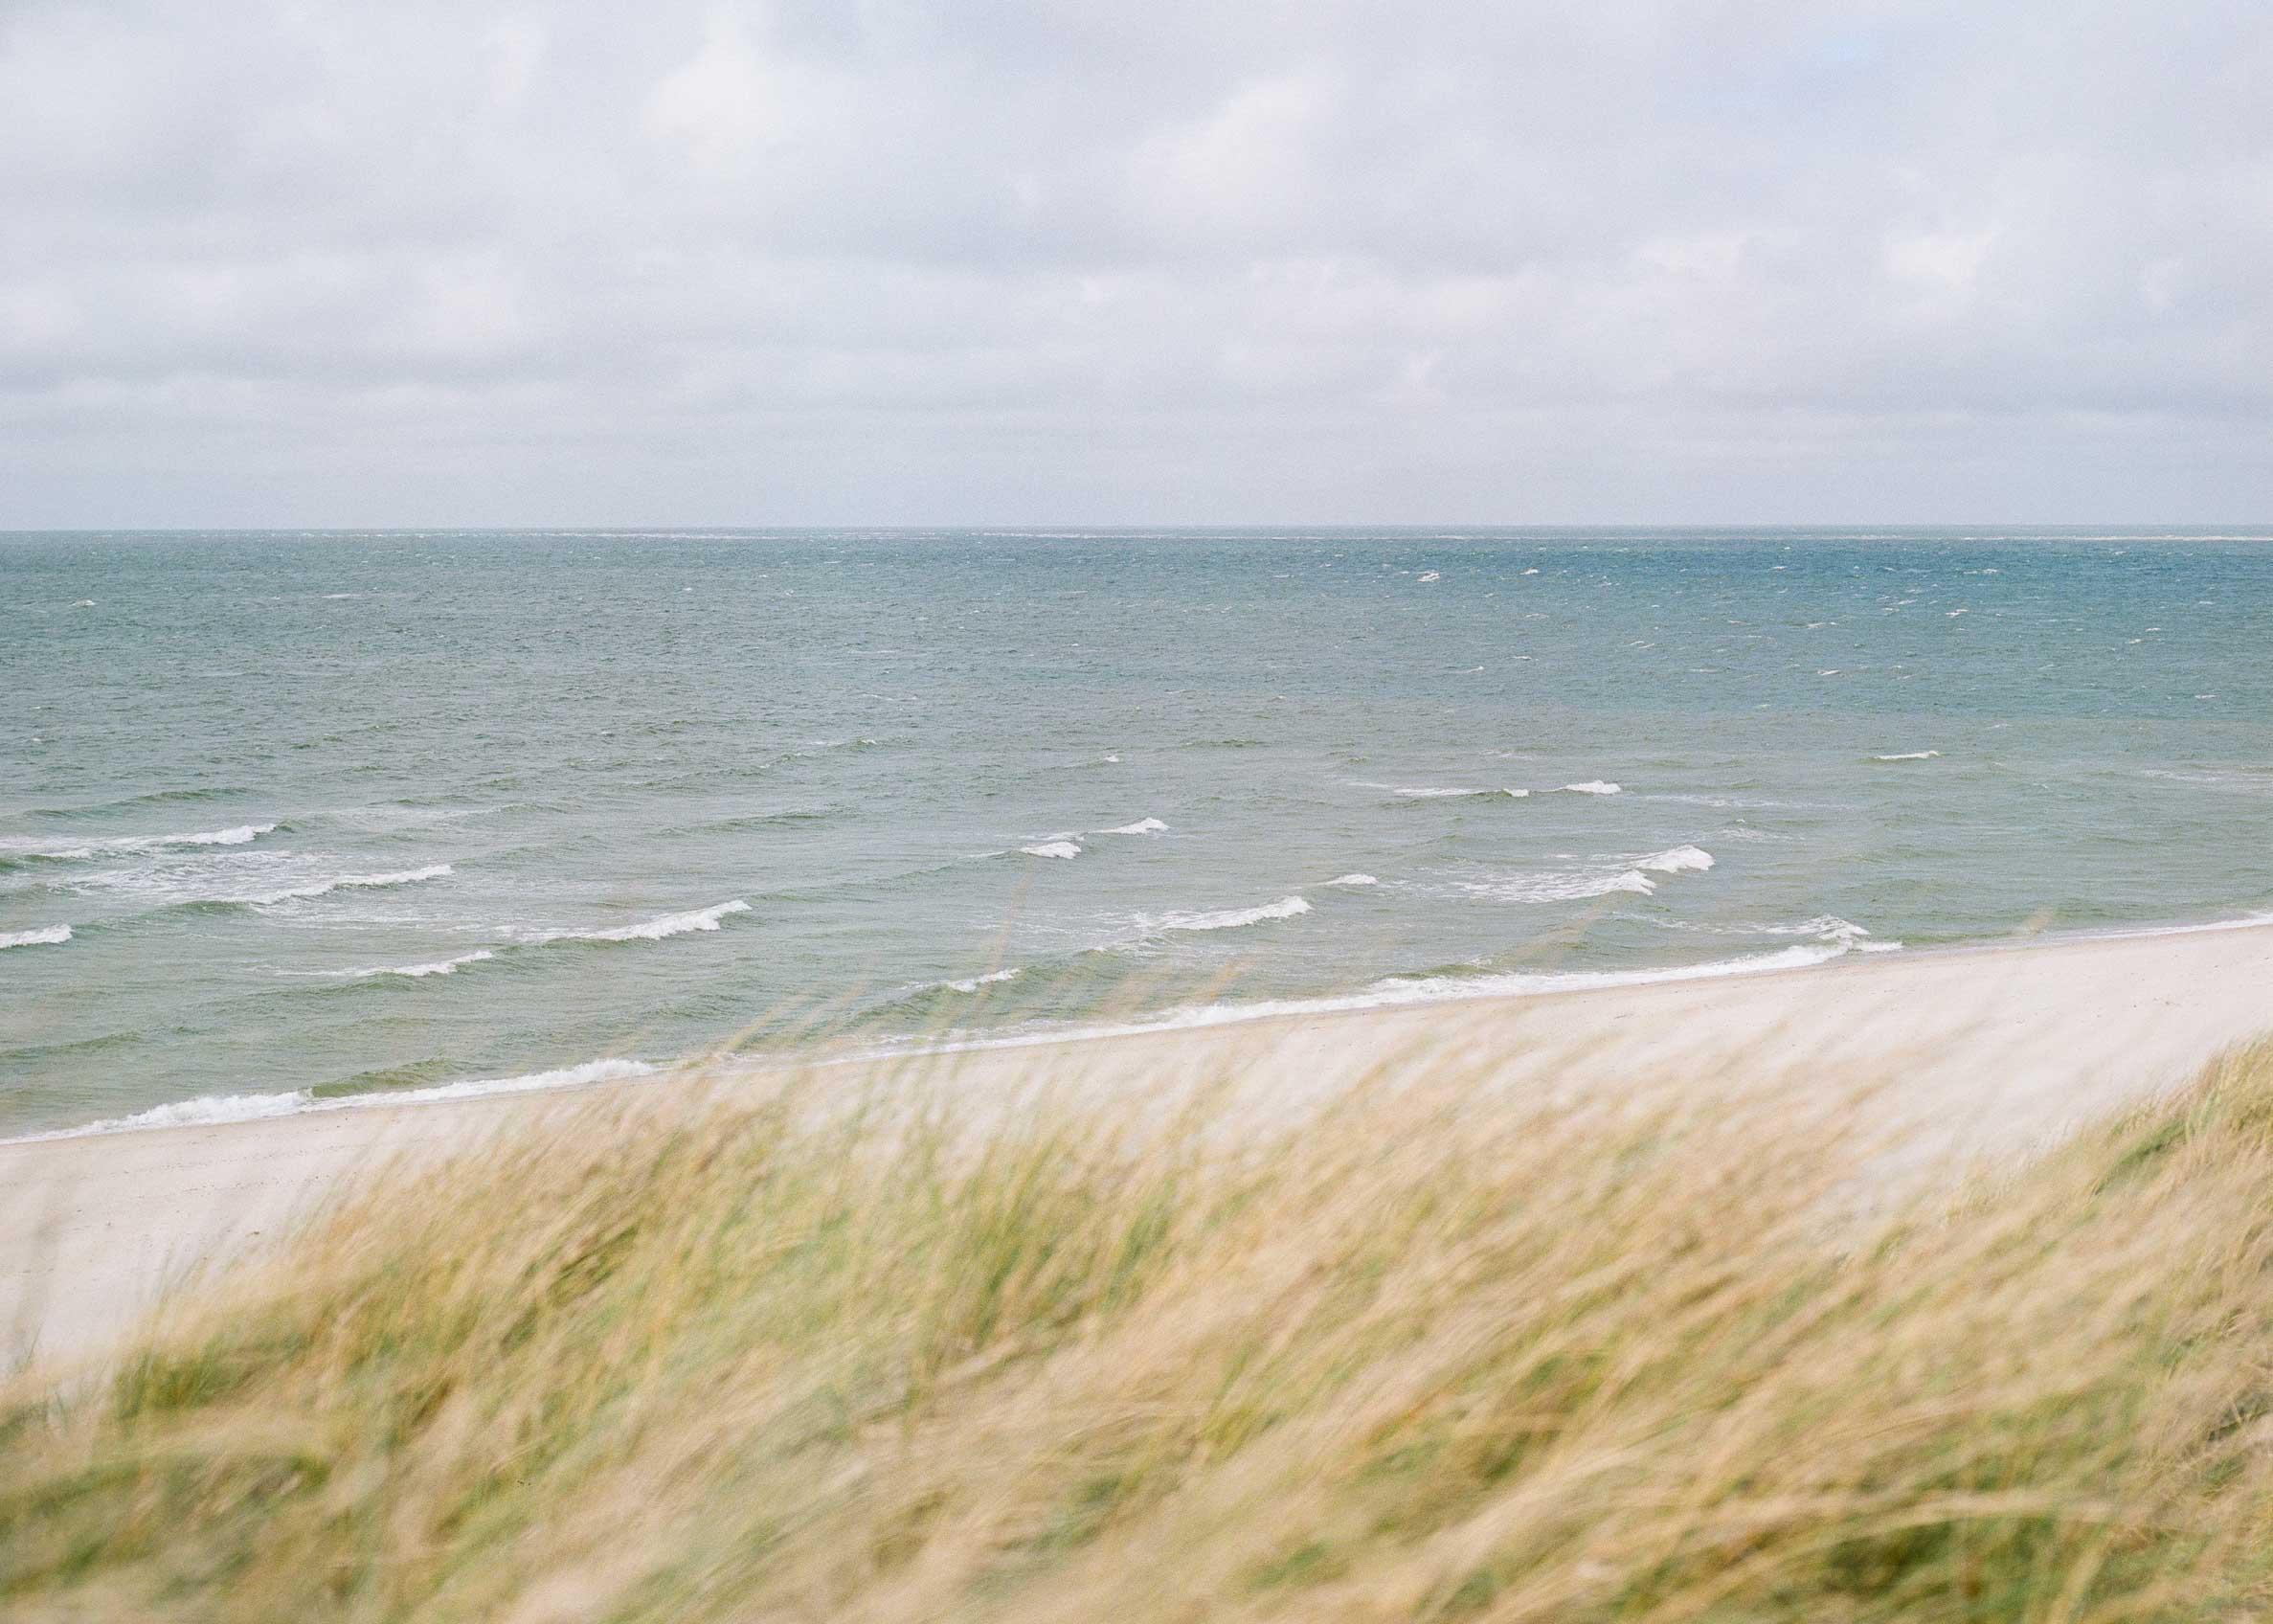 Westküste Sylt (Lennart Filthuth - Mamiya 645, Kodak Portra 400)